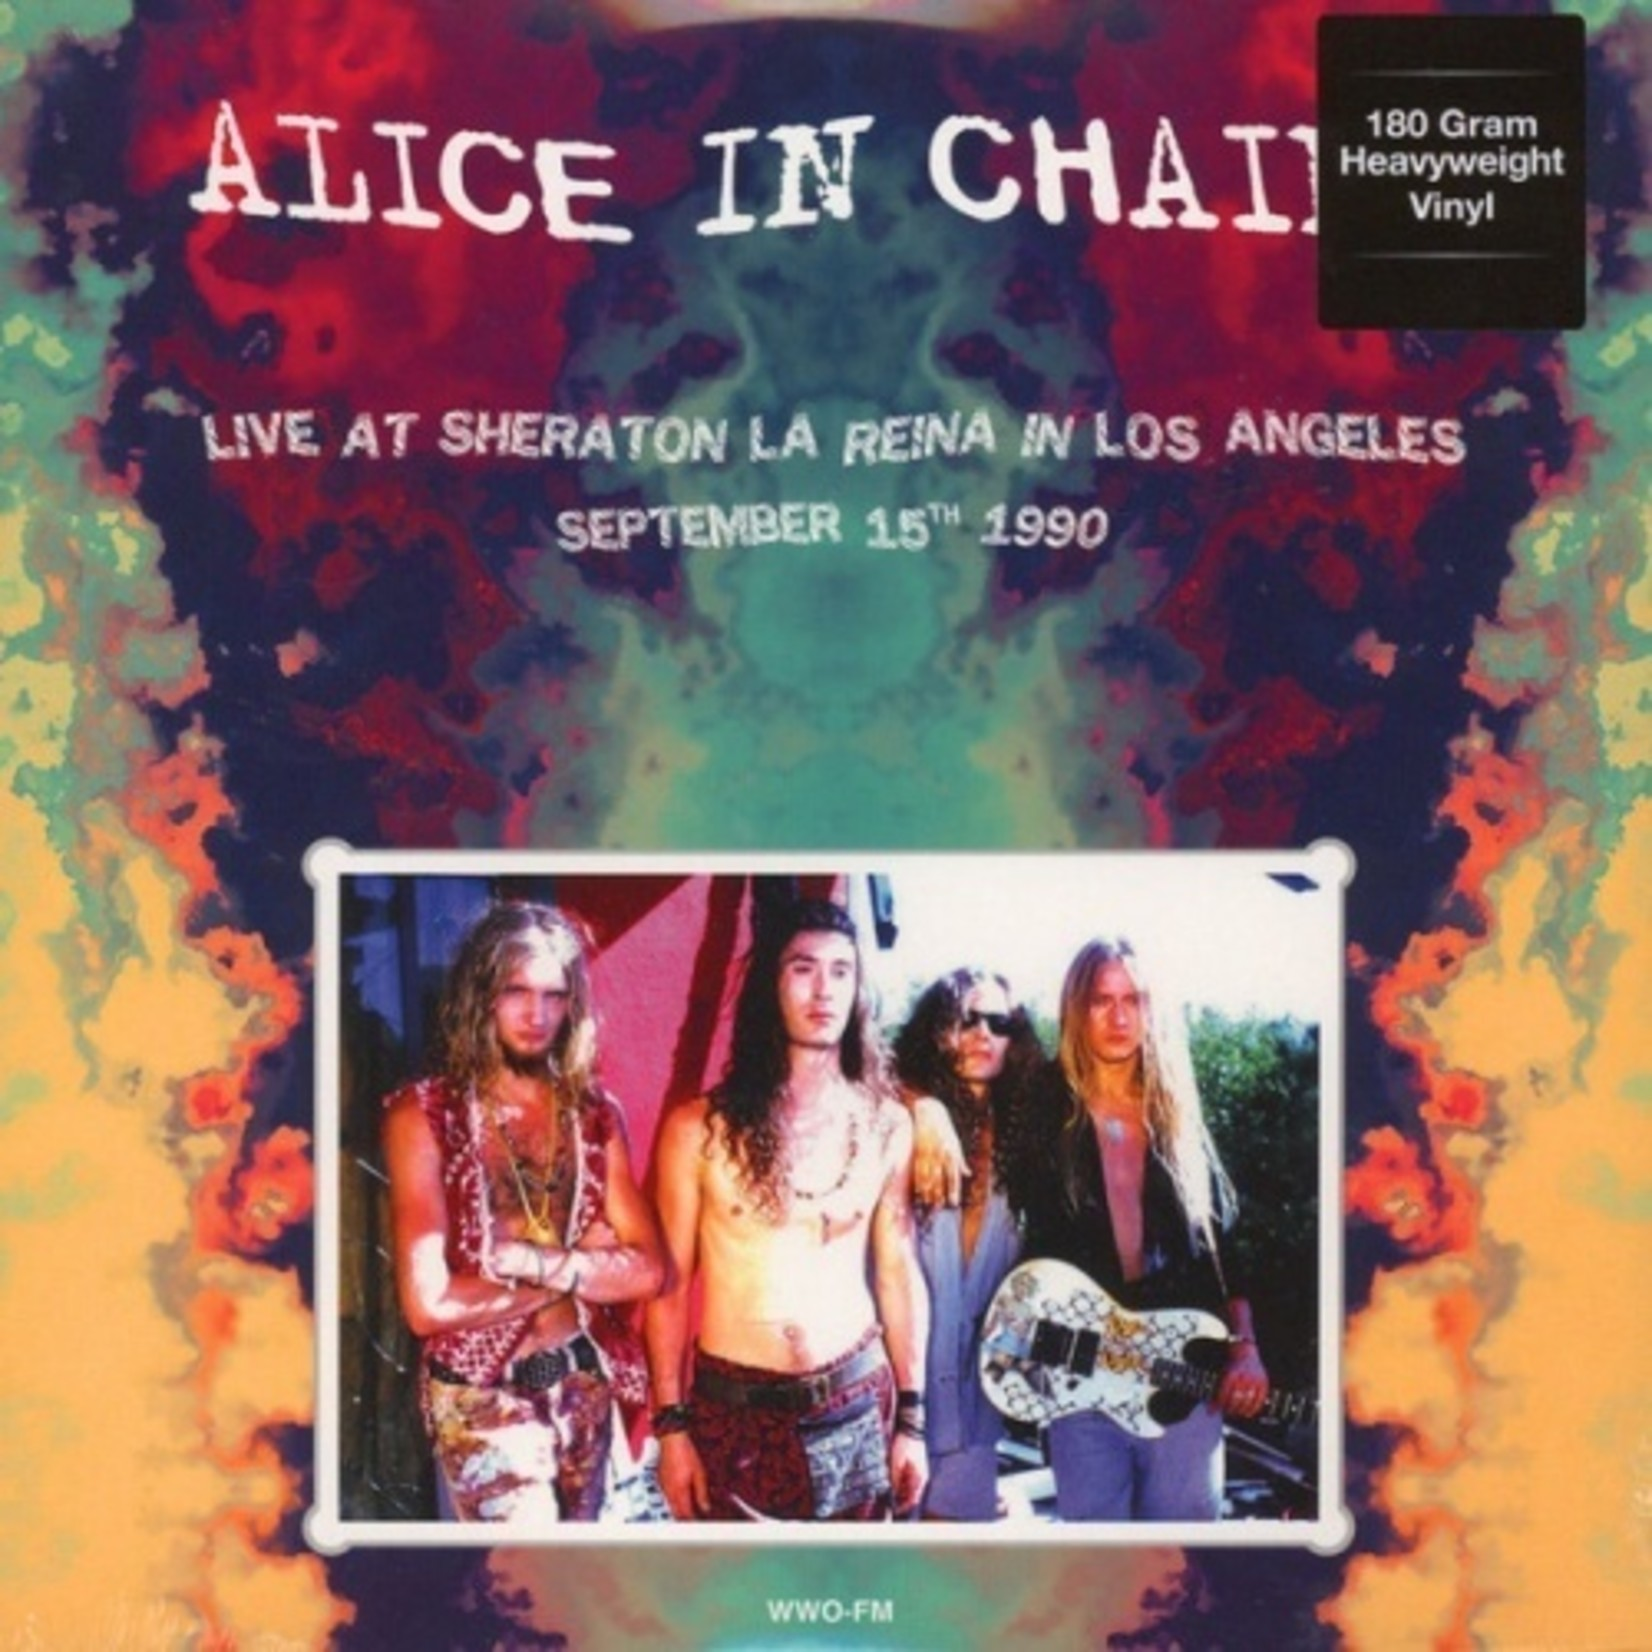 Vinyl Alice In Chains - Live at Sheraton La Reina Sept 15th, 1990